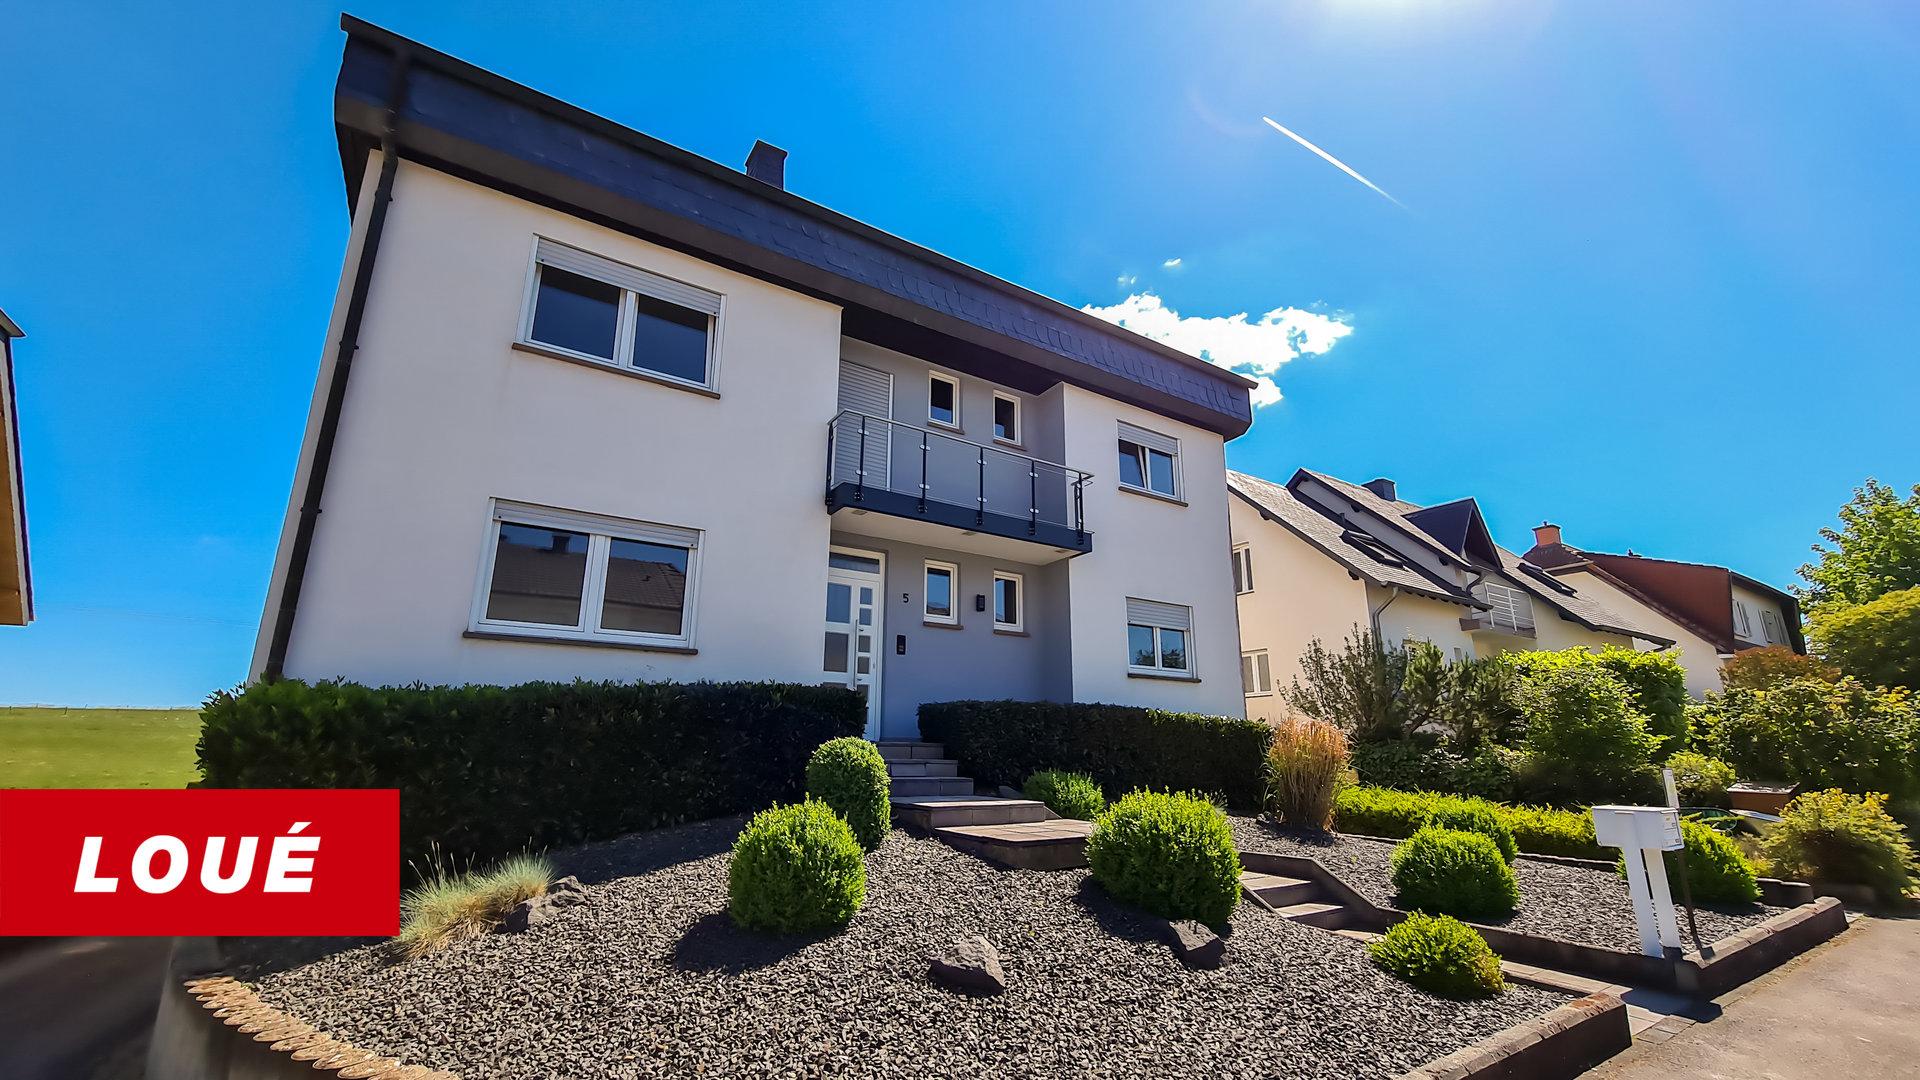 RENTED - appartment with 3 bedrooms in Gonderange